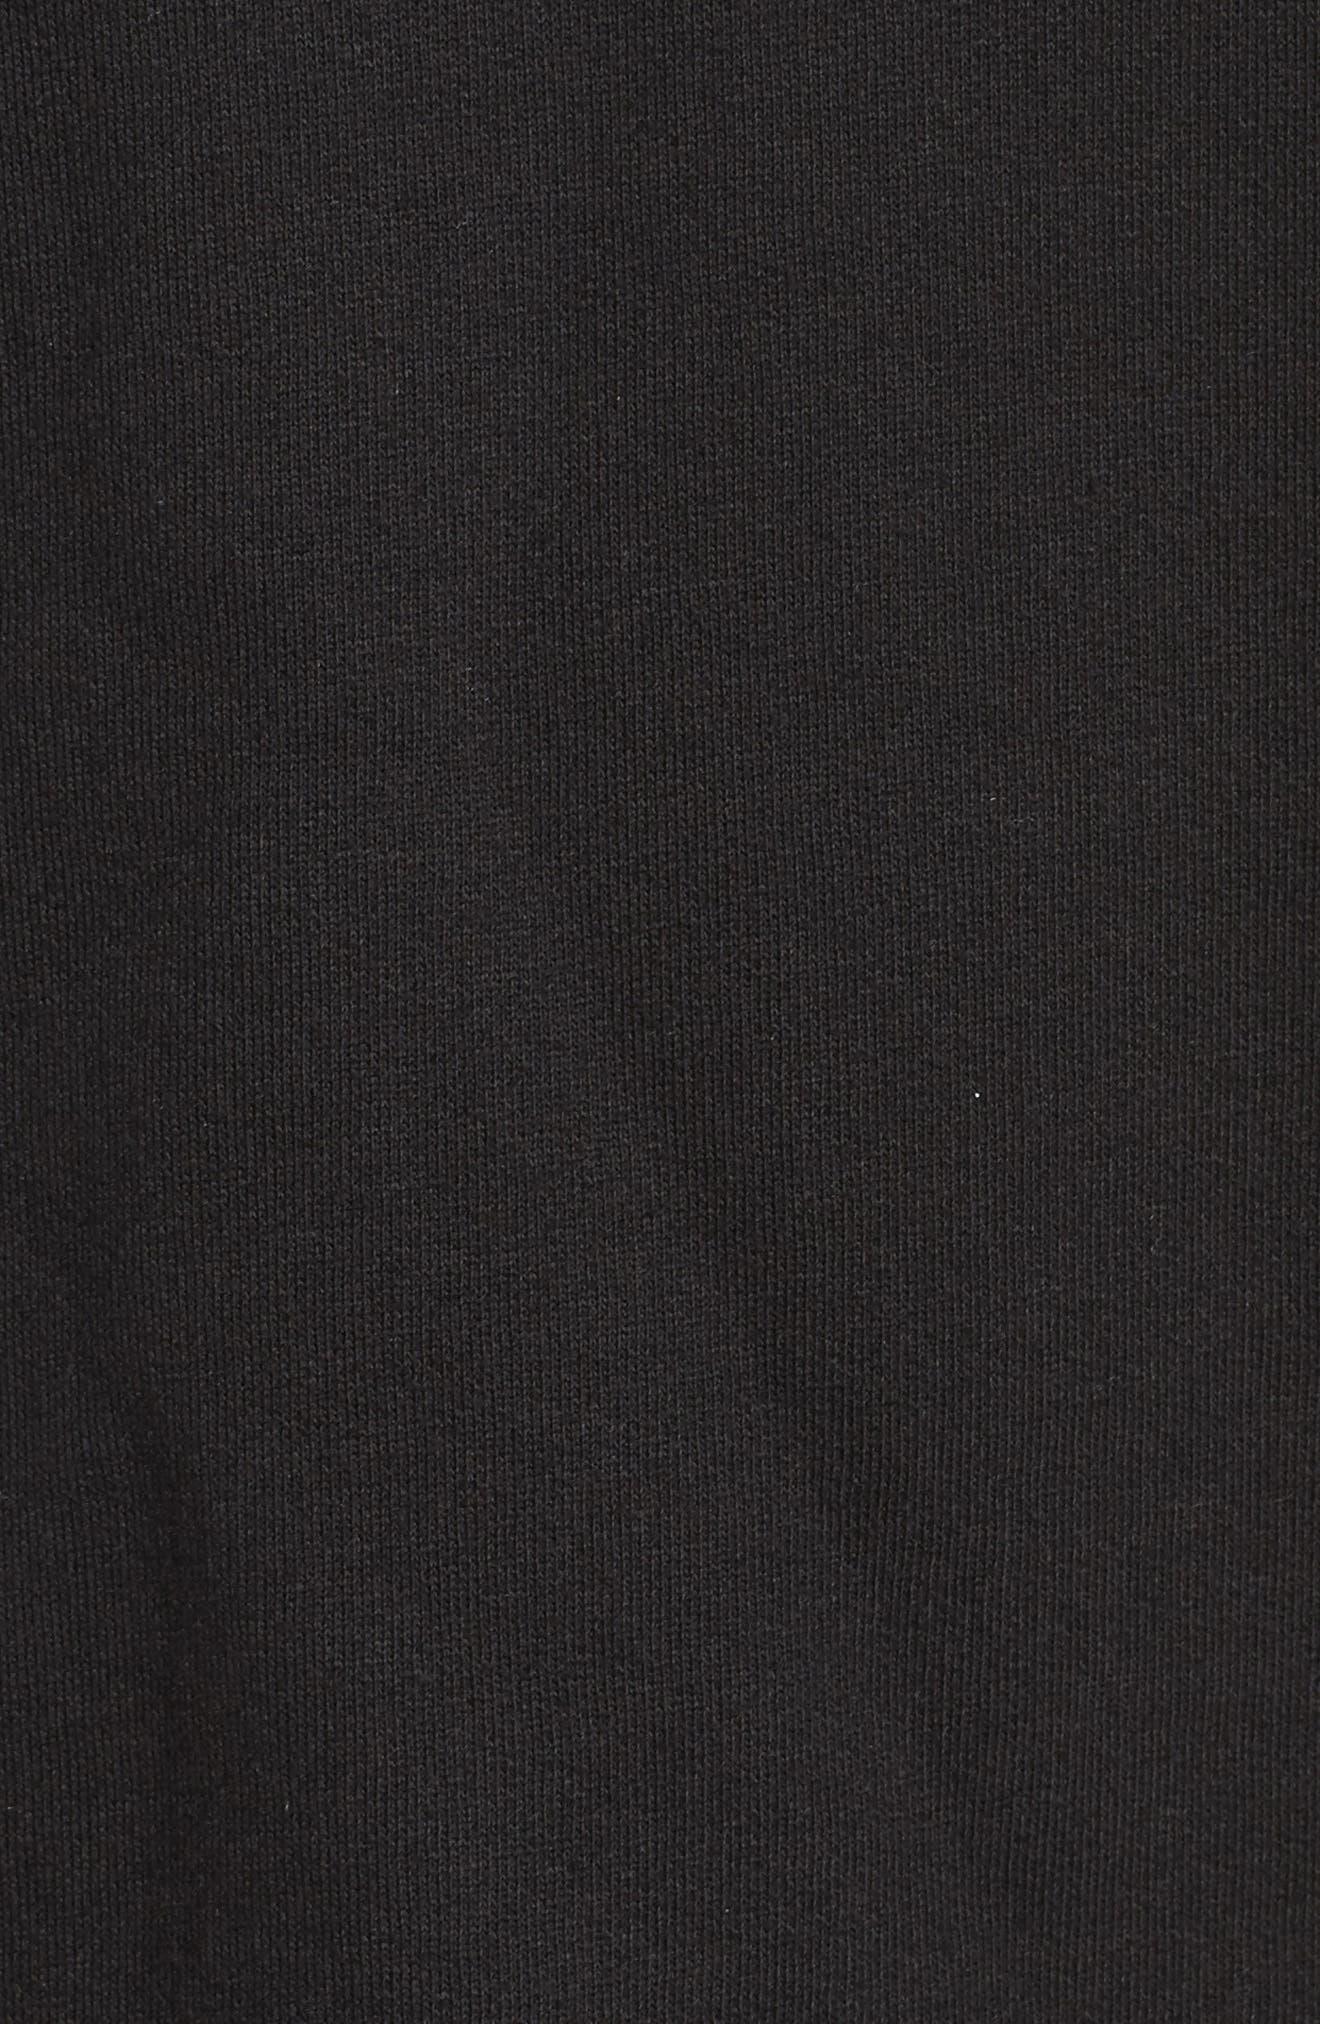 Brunette Lounge Hoodie,                             Alternate thumbnail 5, color,                             Black